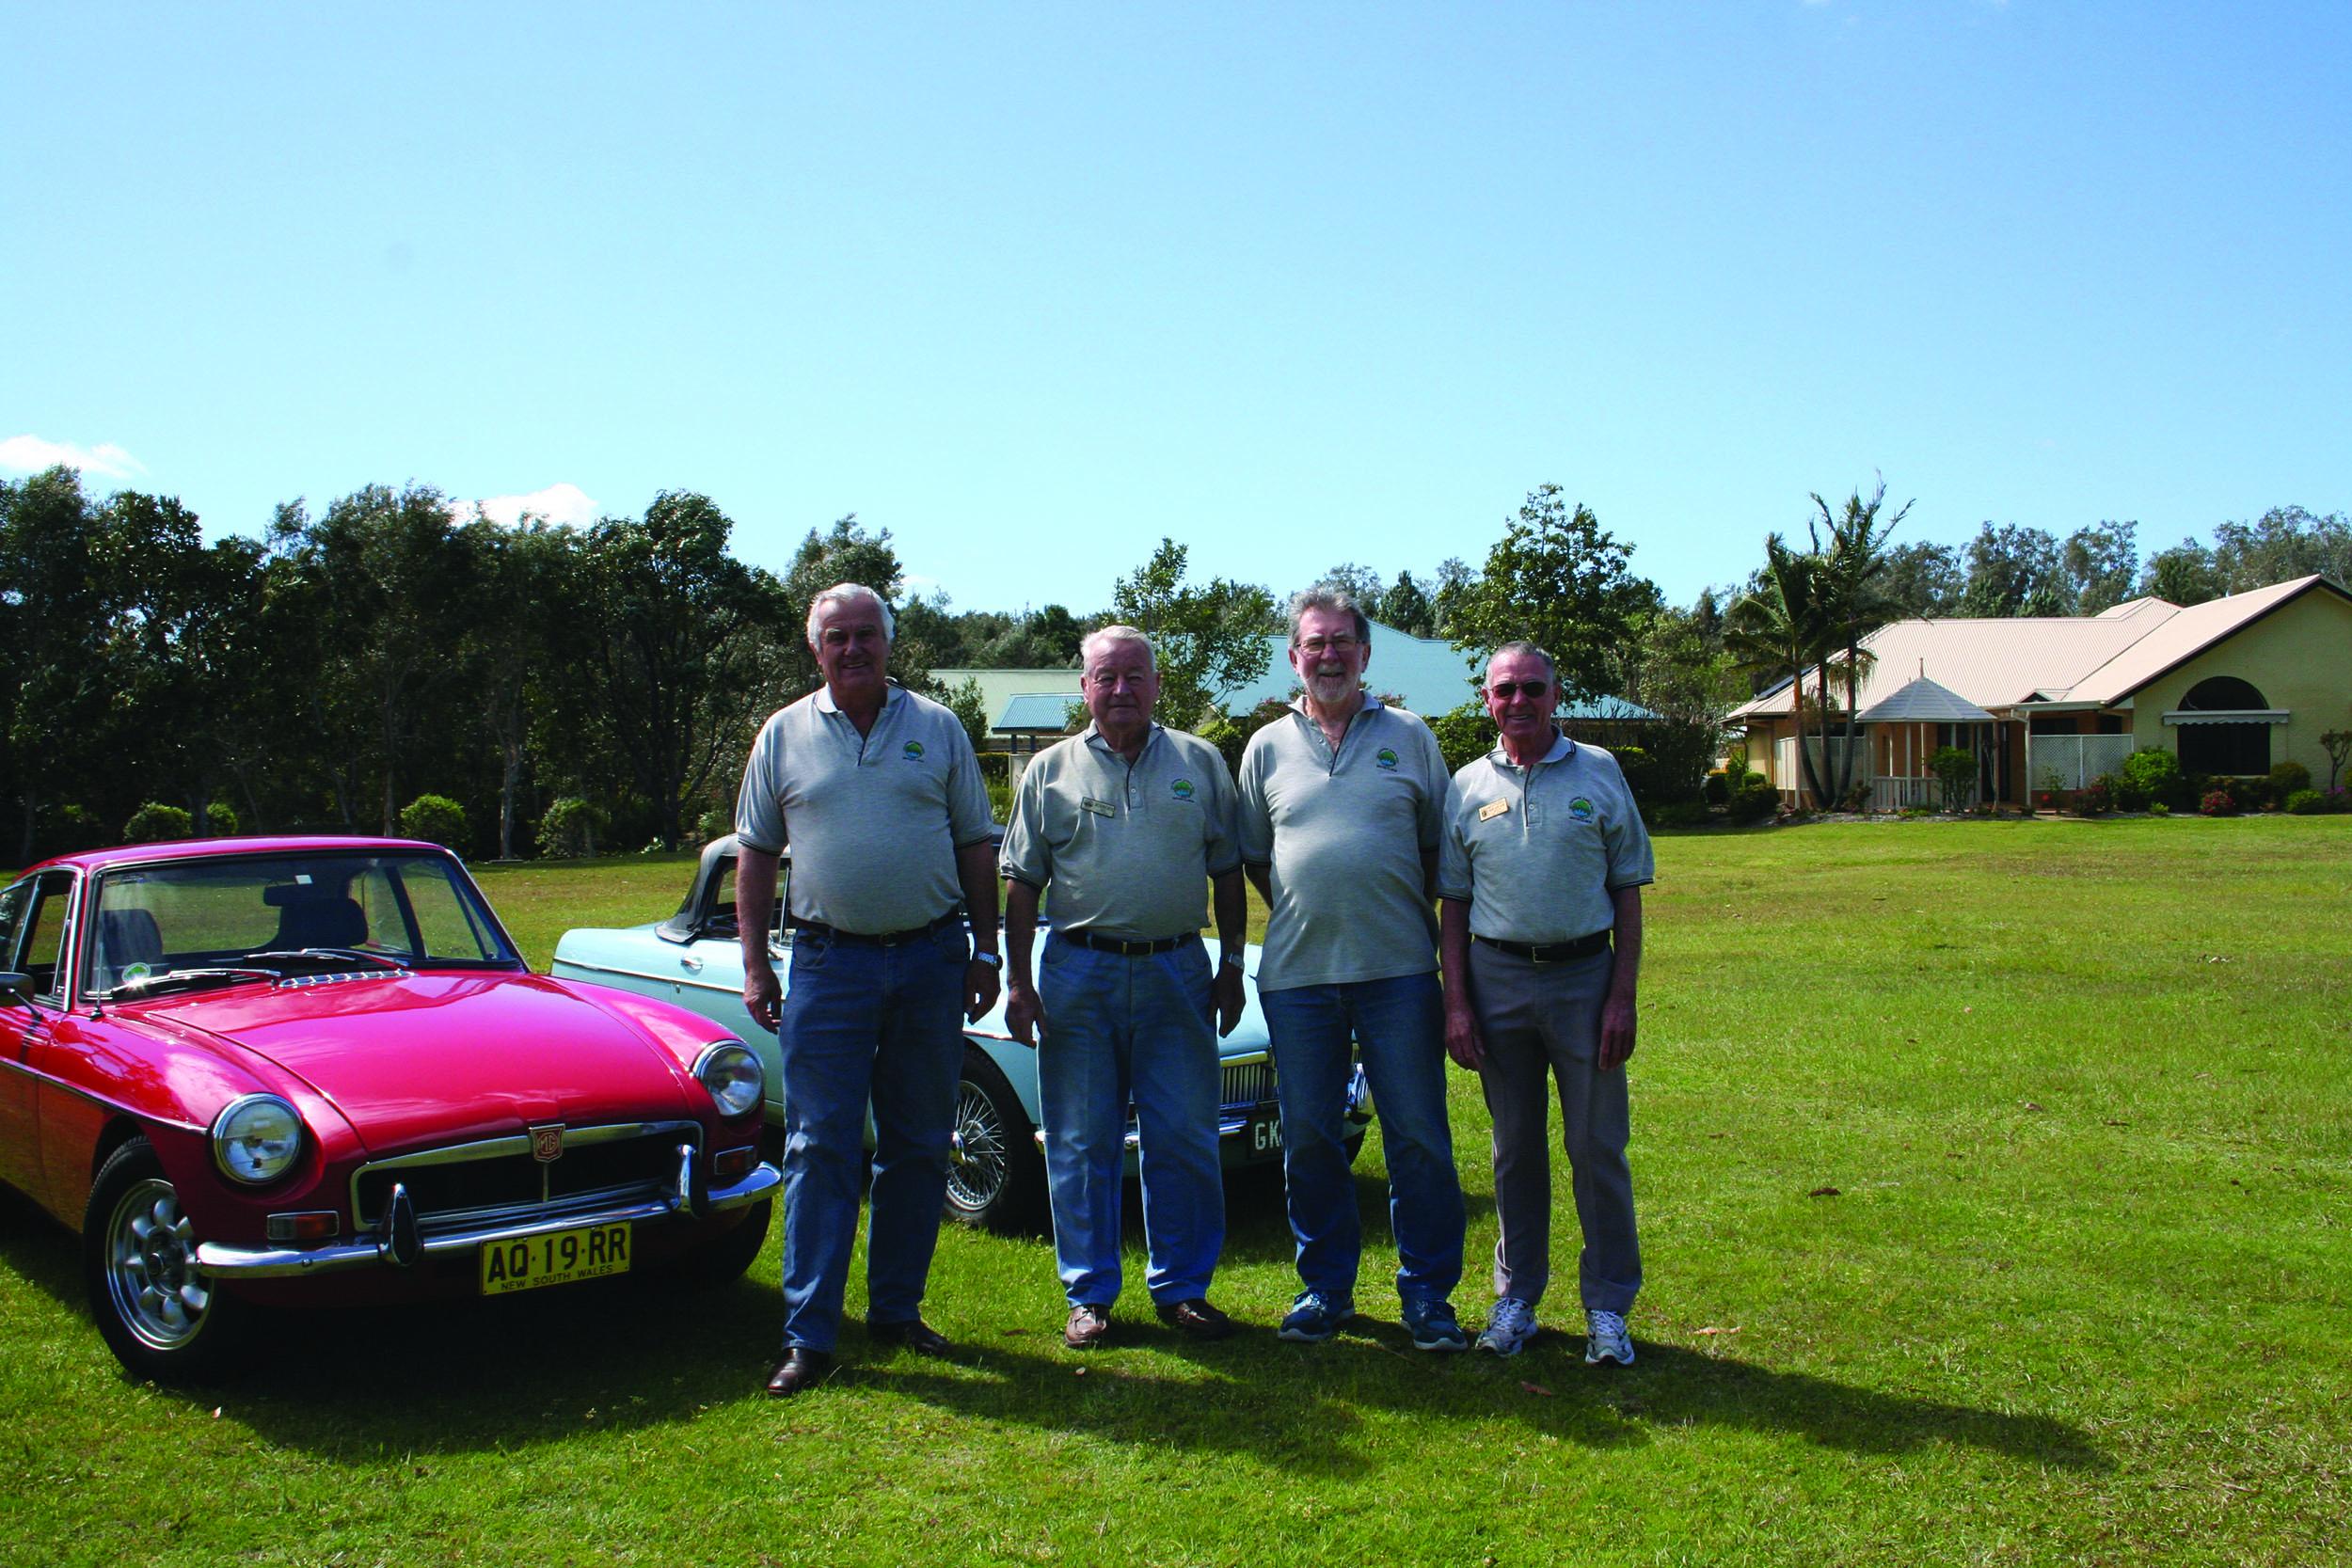 The new Club Committee Ranald Mackay, Juergen Seil, Phil Hoare, Graham Kelly.